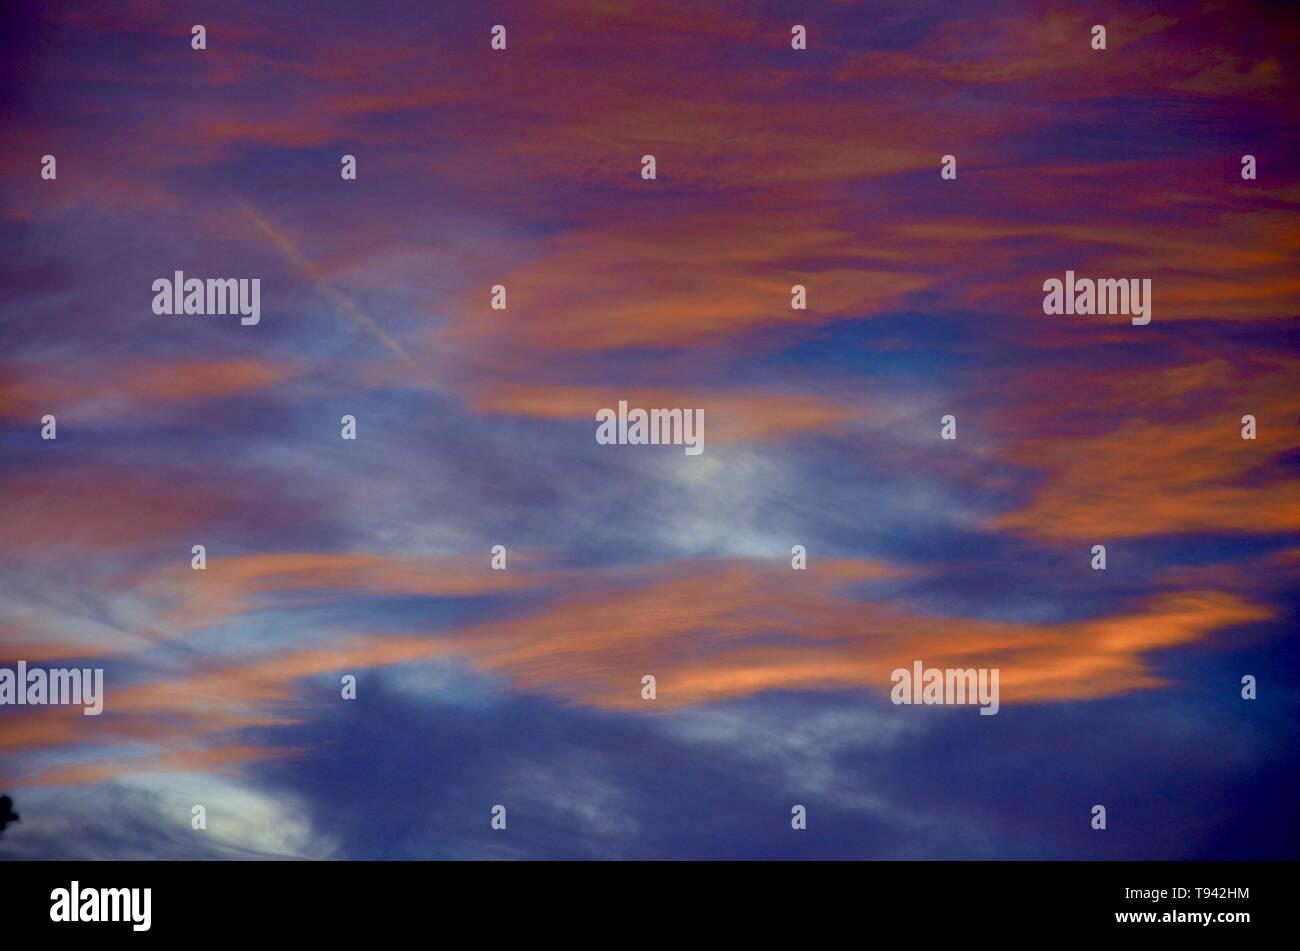 Himmel im Sonnenuntergang - Stock Image